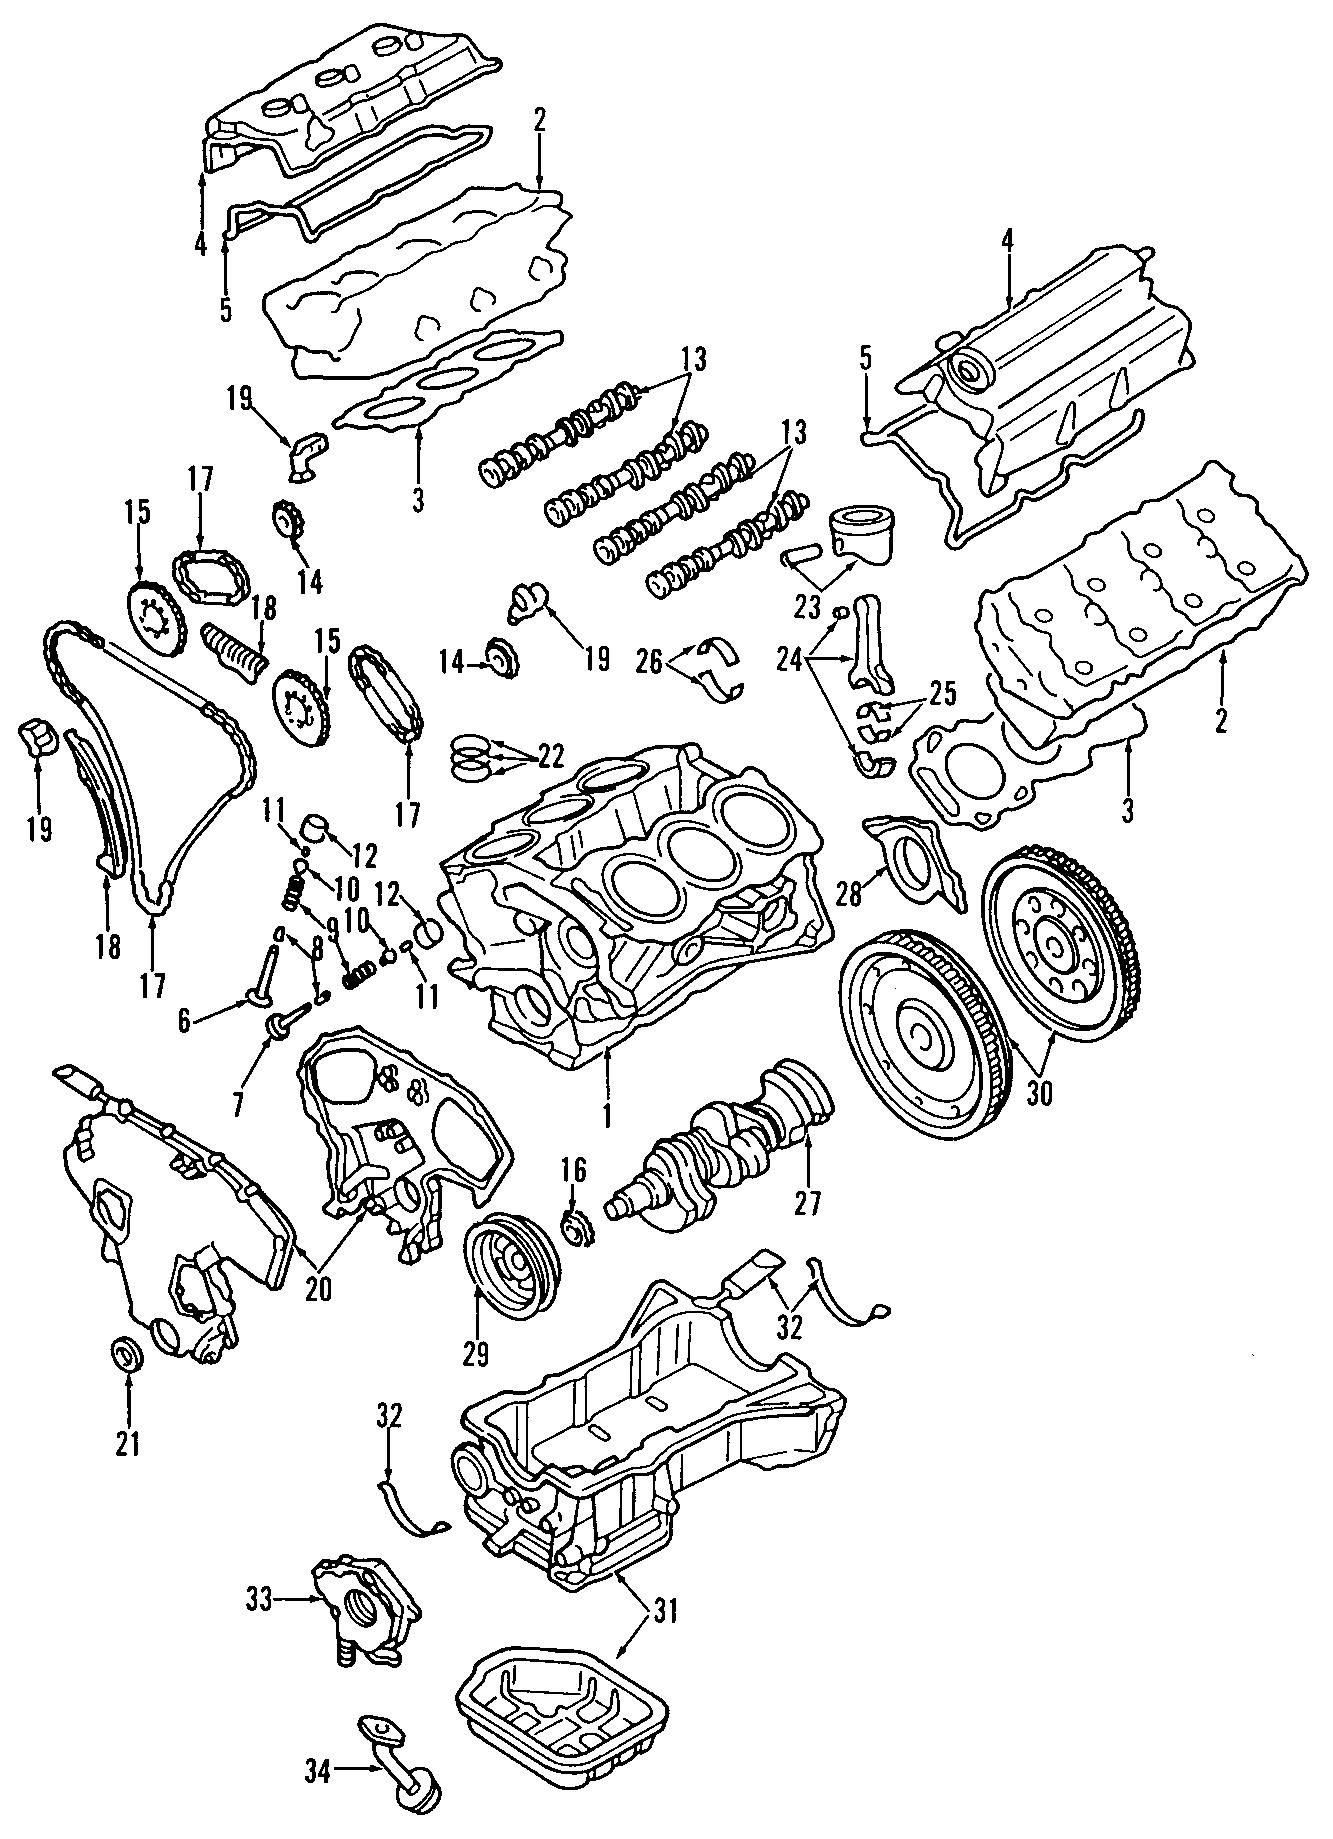 Nissan Altima Engine Variable Valve Timing (VVT) Solenoid